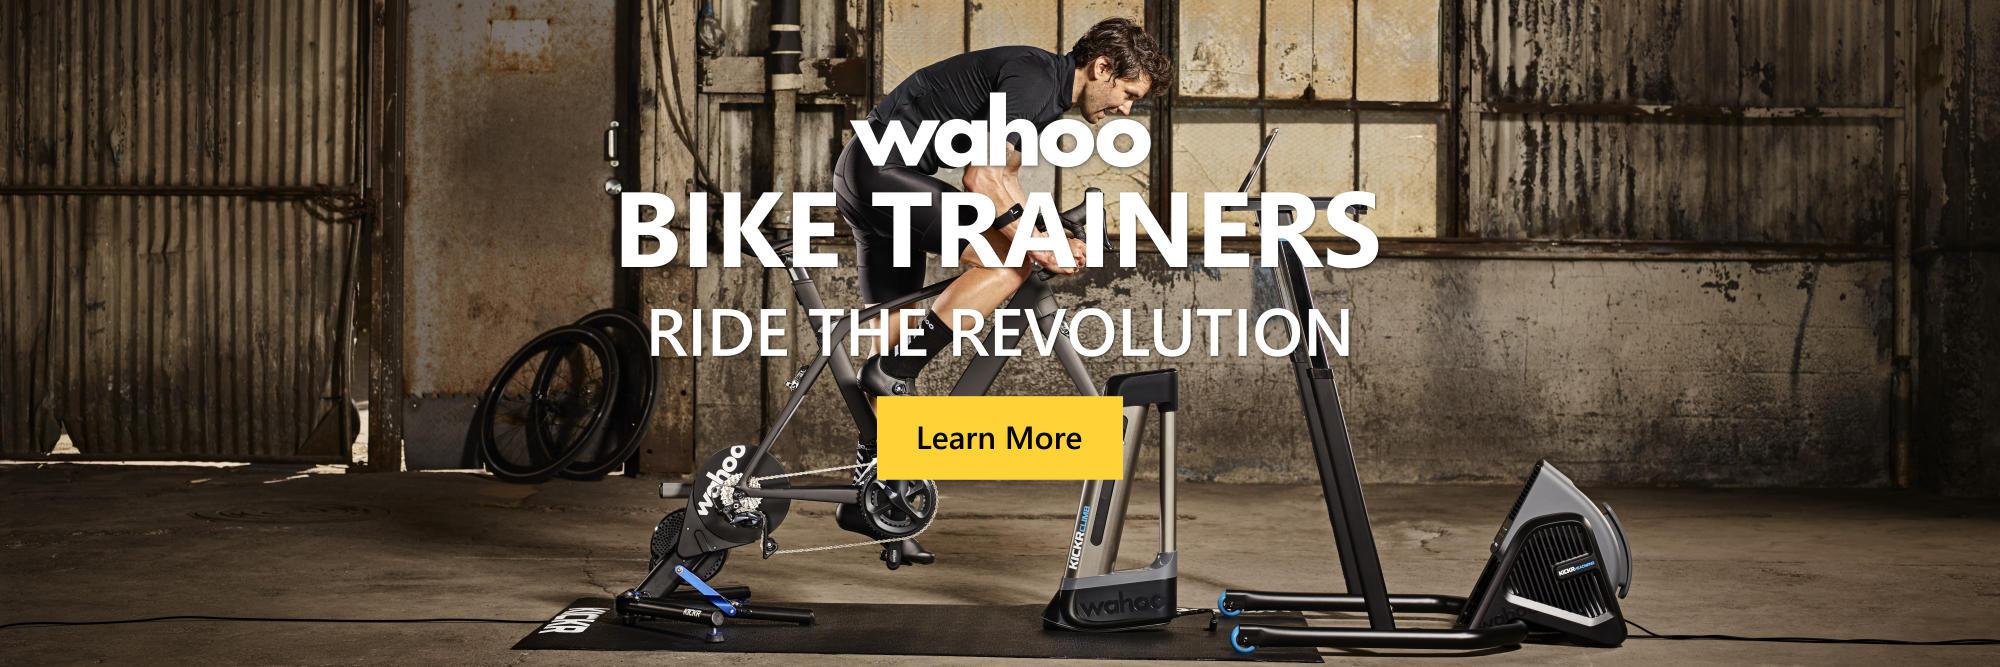 WAHOO BIKE TRAINERS